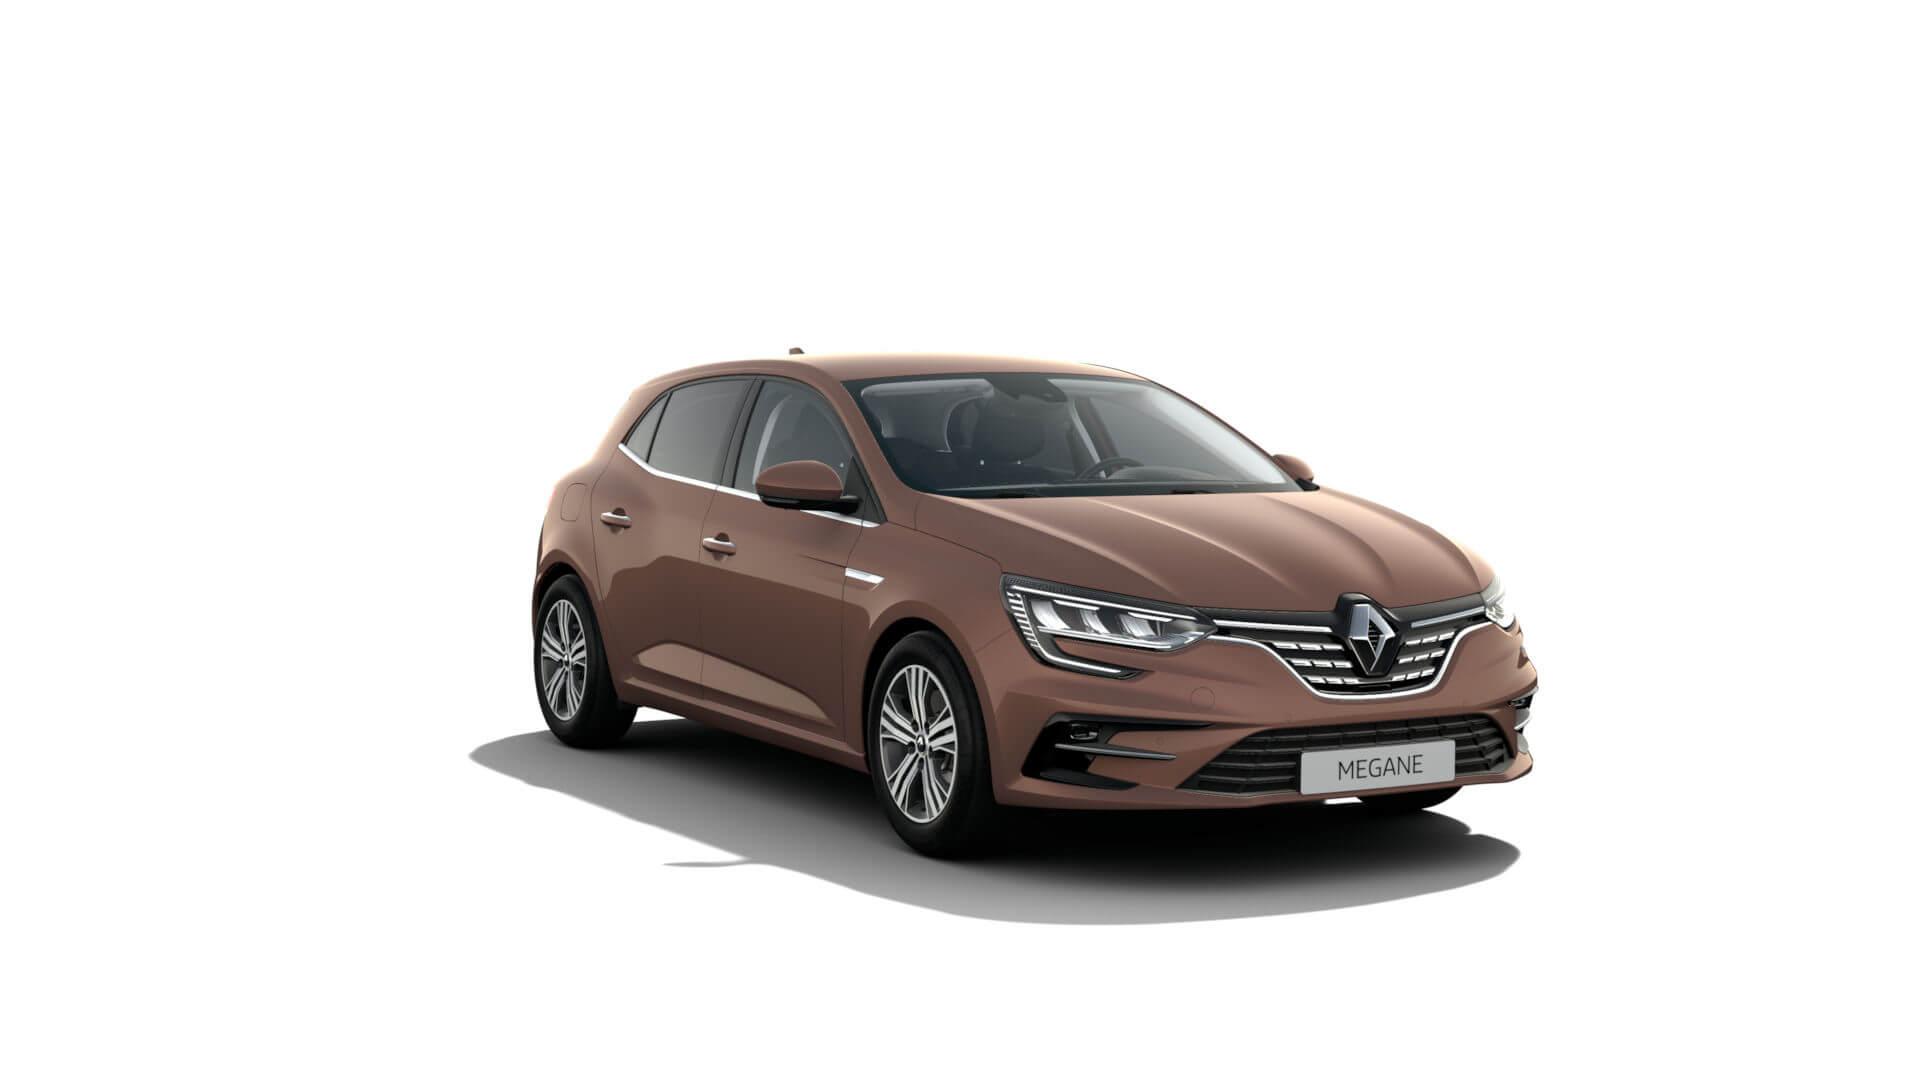 Automodell braun - Renault Megane - Renault Ahrens Hannover